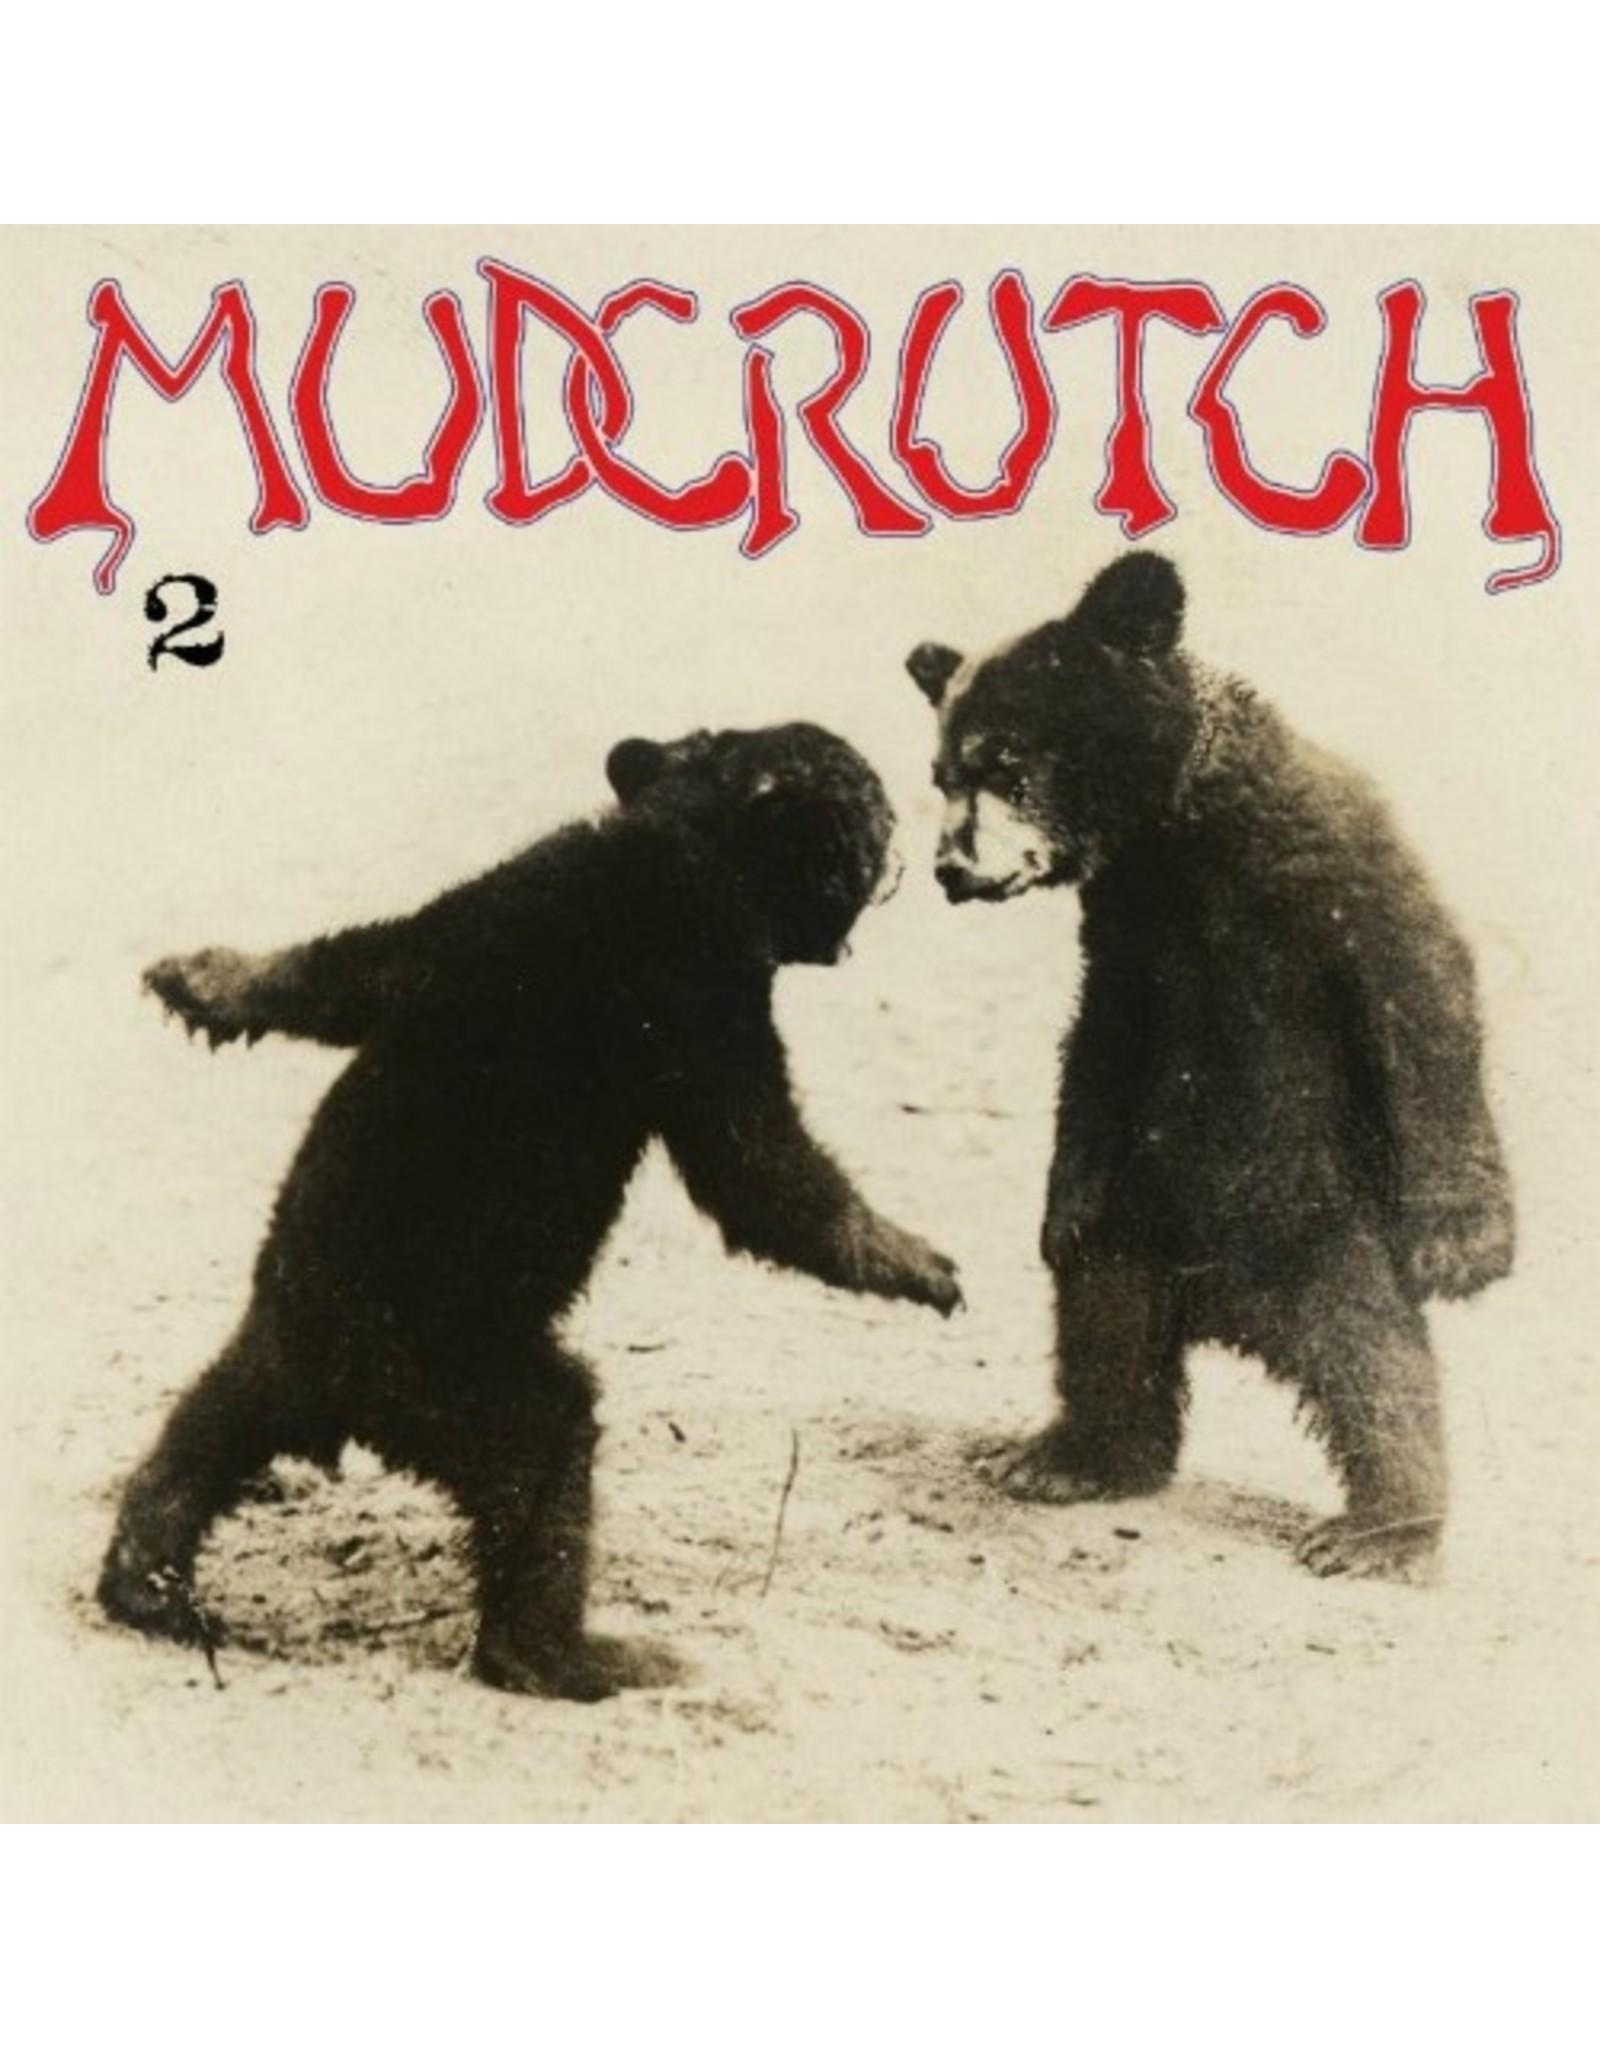 New Vinyl Mudcrutch - 2 LP